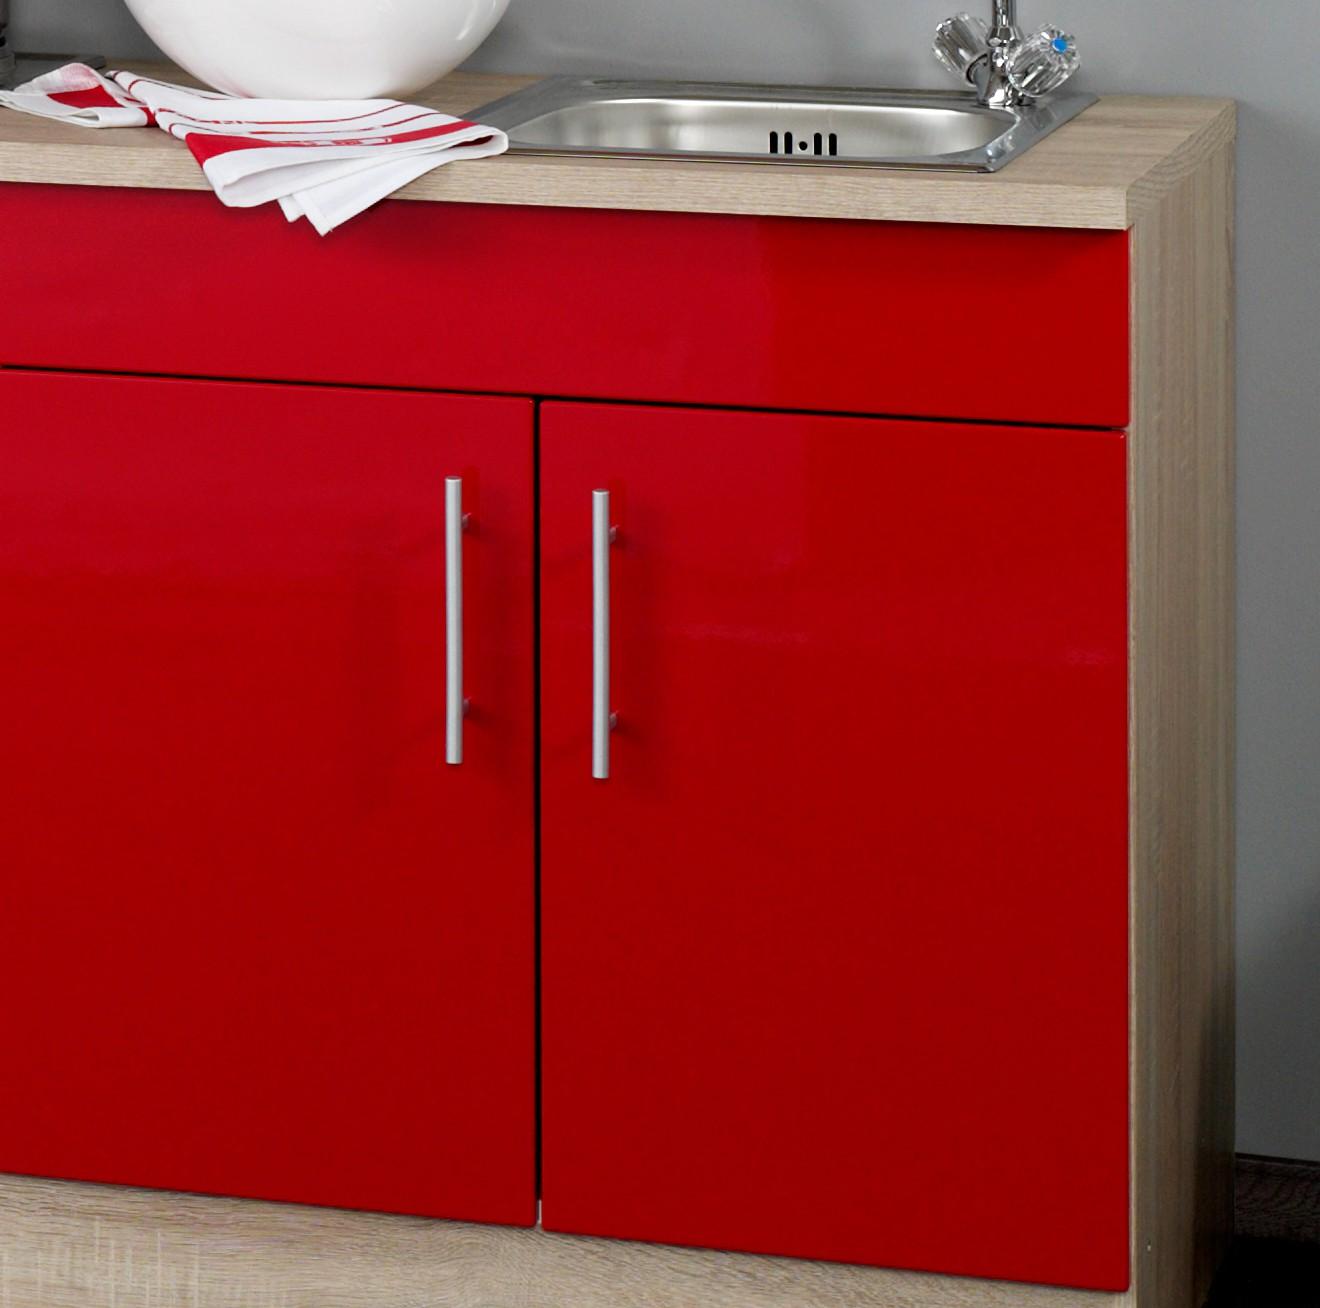 singlek che berlin breite 180 cm hochglanz rot eiche sonoma k che singlek chen. Black Bedroom Furniture Sets. Home Design Ideas